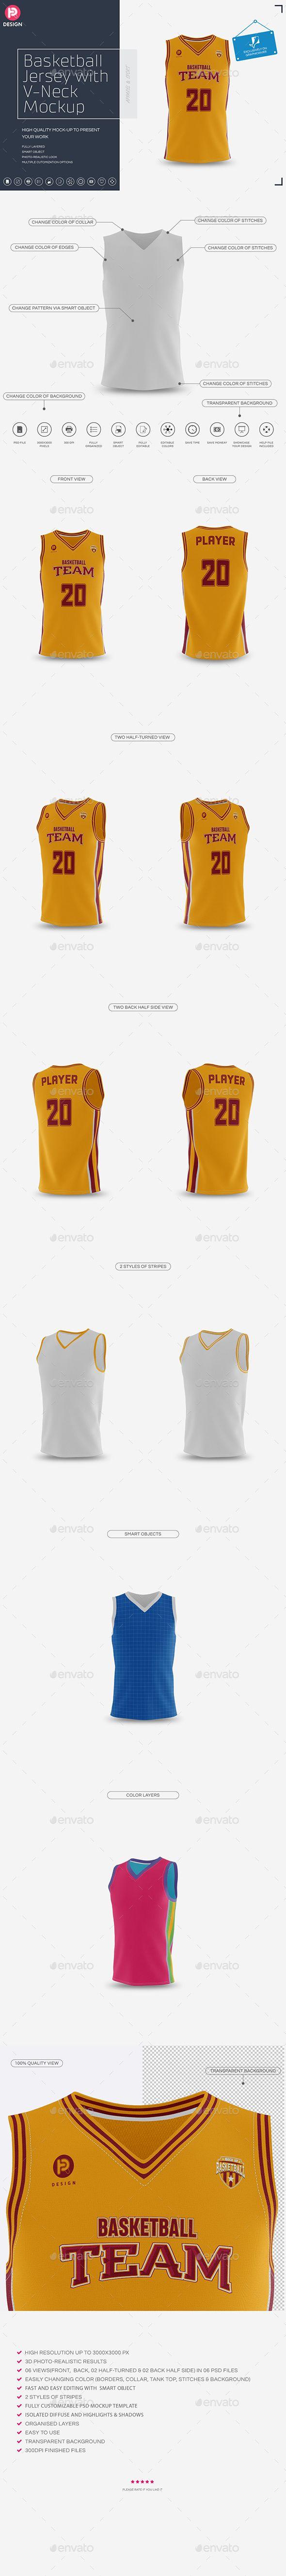 Basketball Jersey with V-Neck Mock-Up